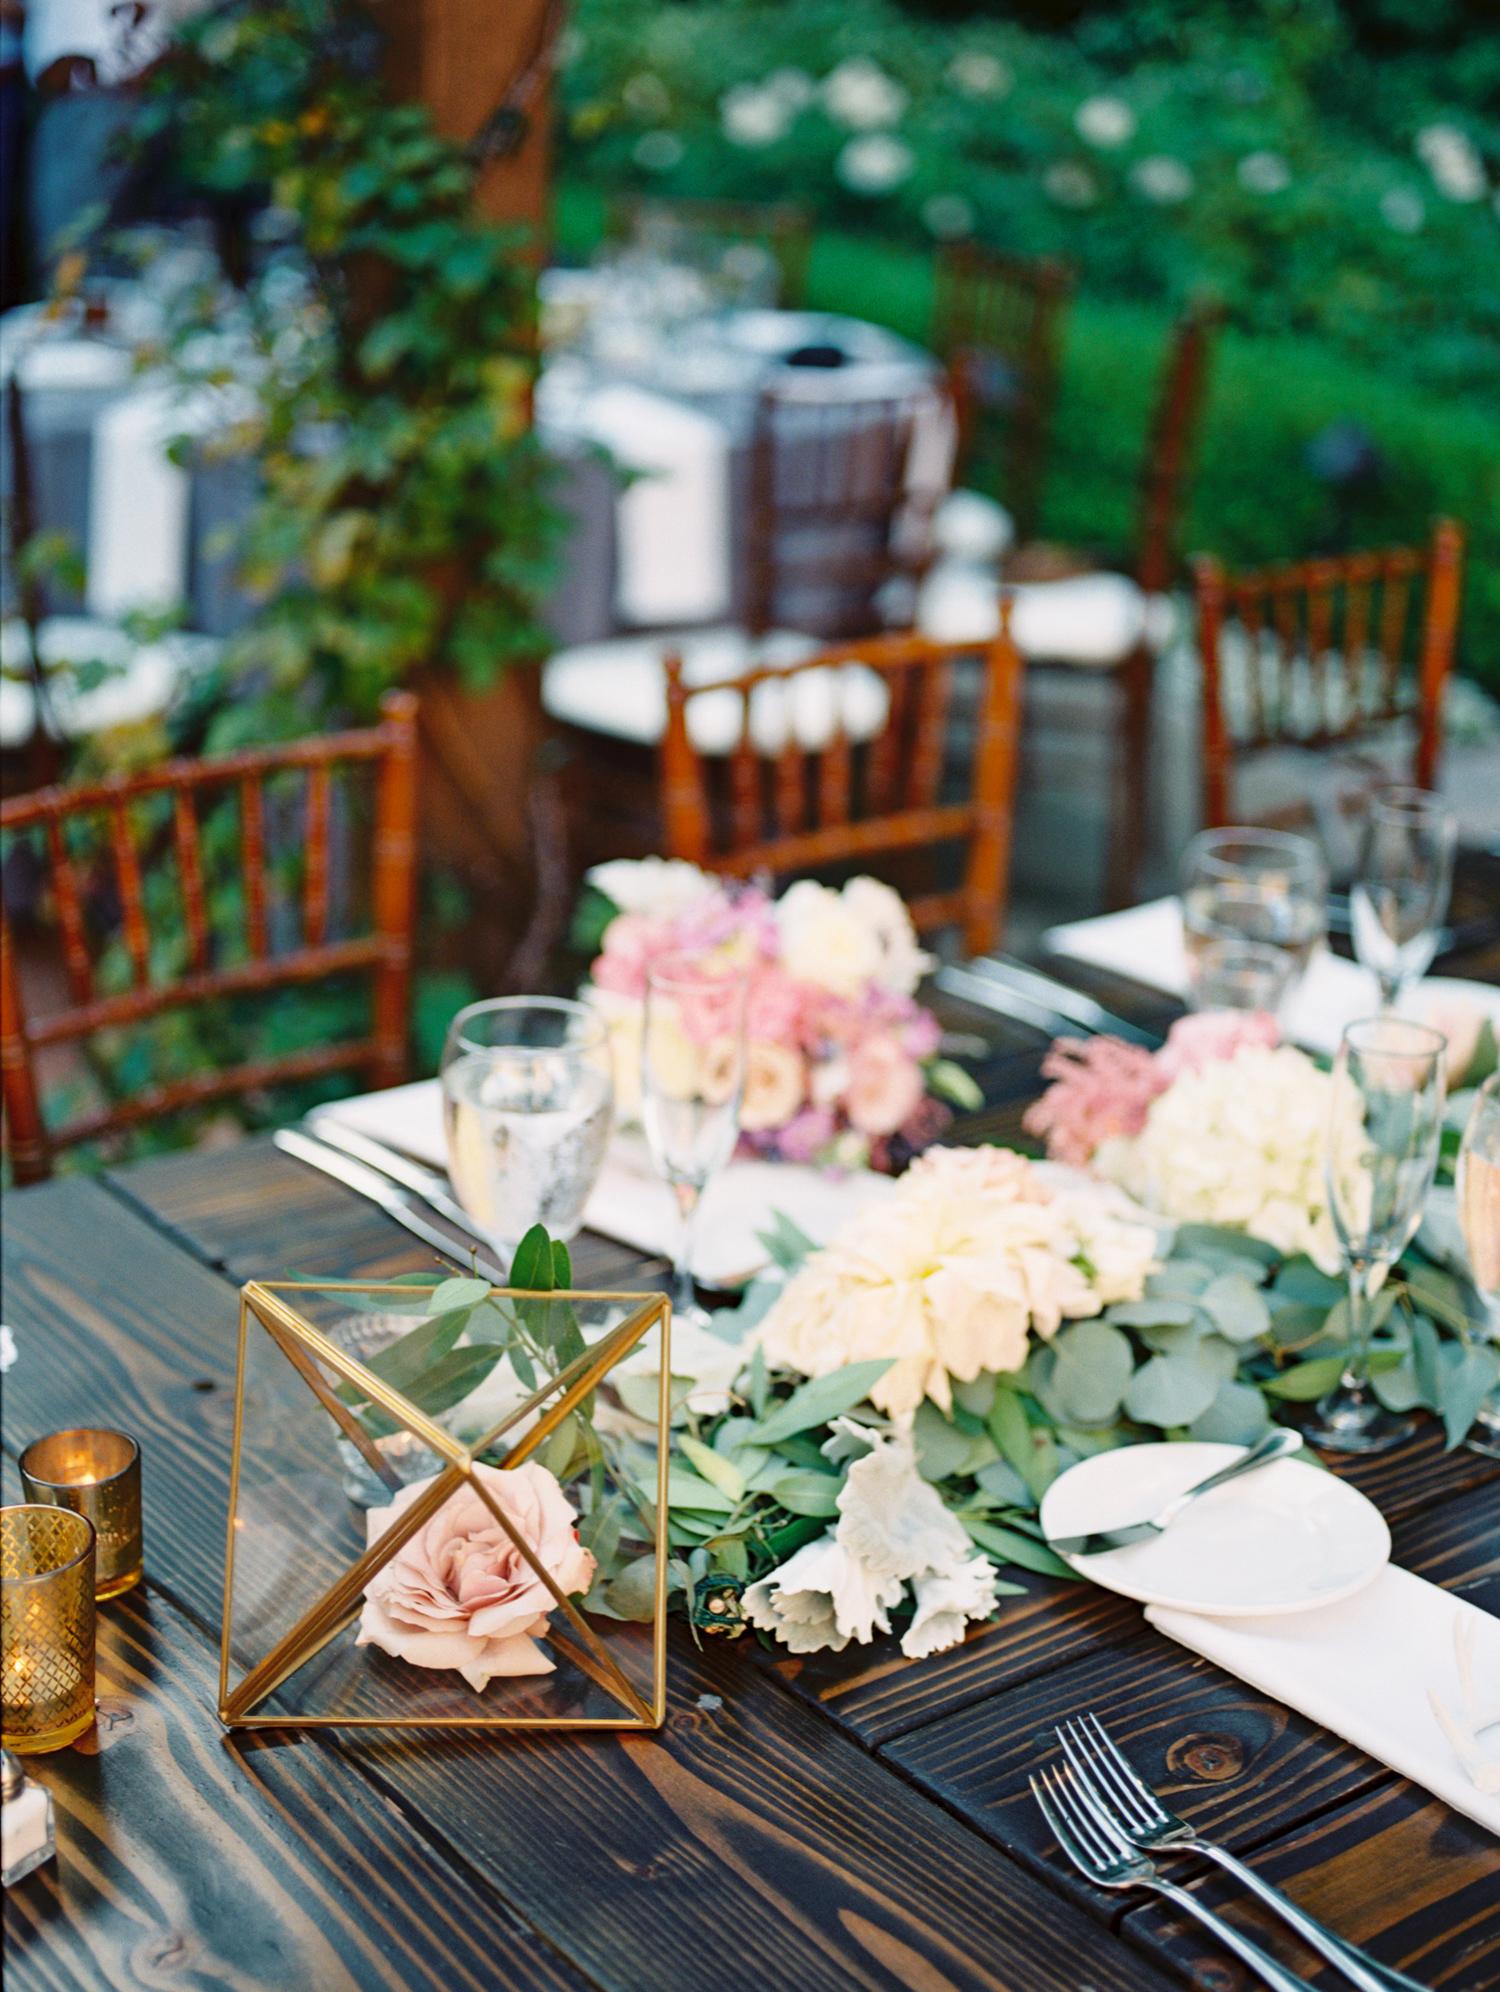 076-Jen-Wojcik-Photography-San-Diego-Wedding-Photographer.jpg